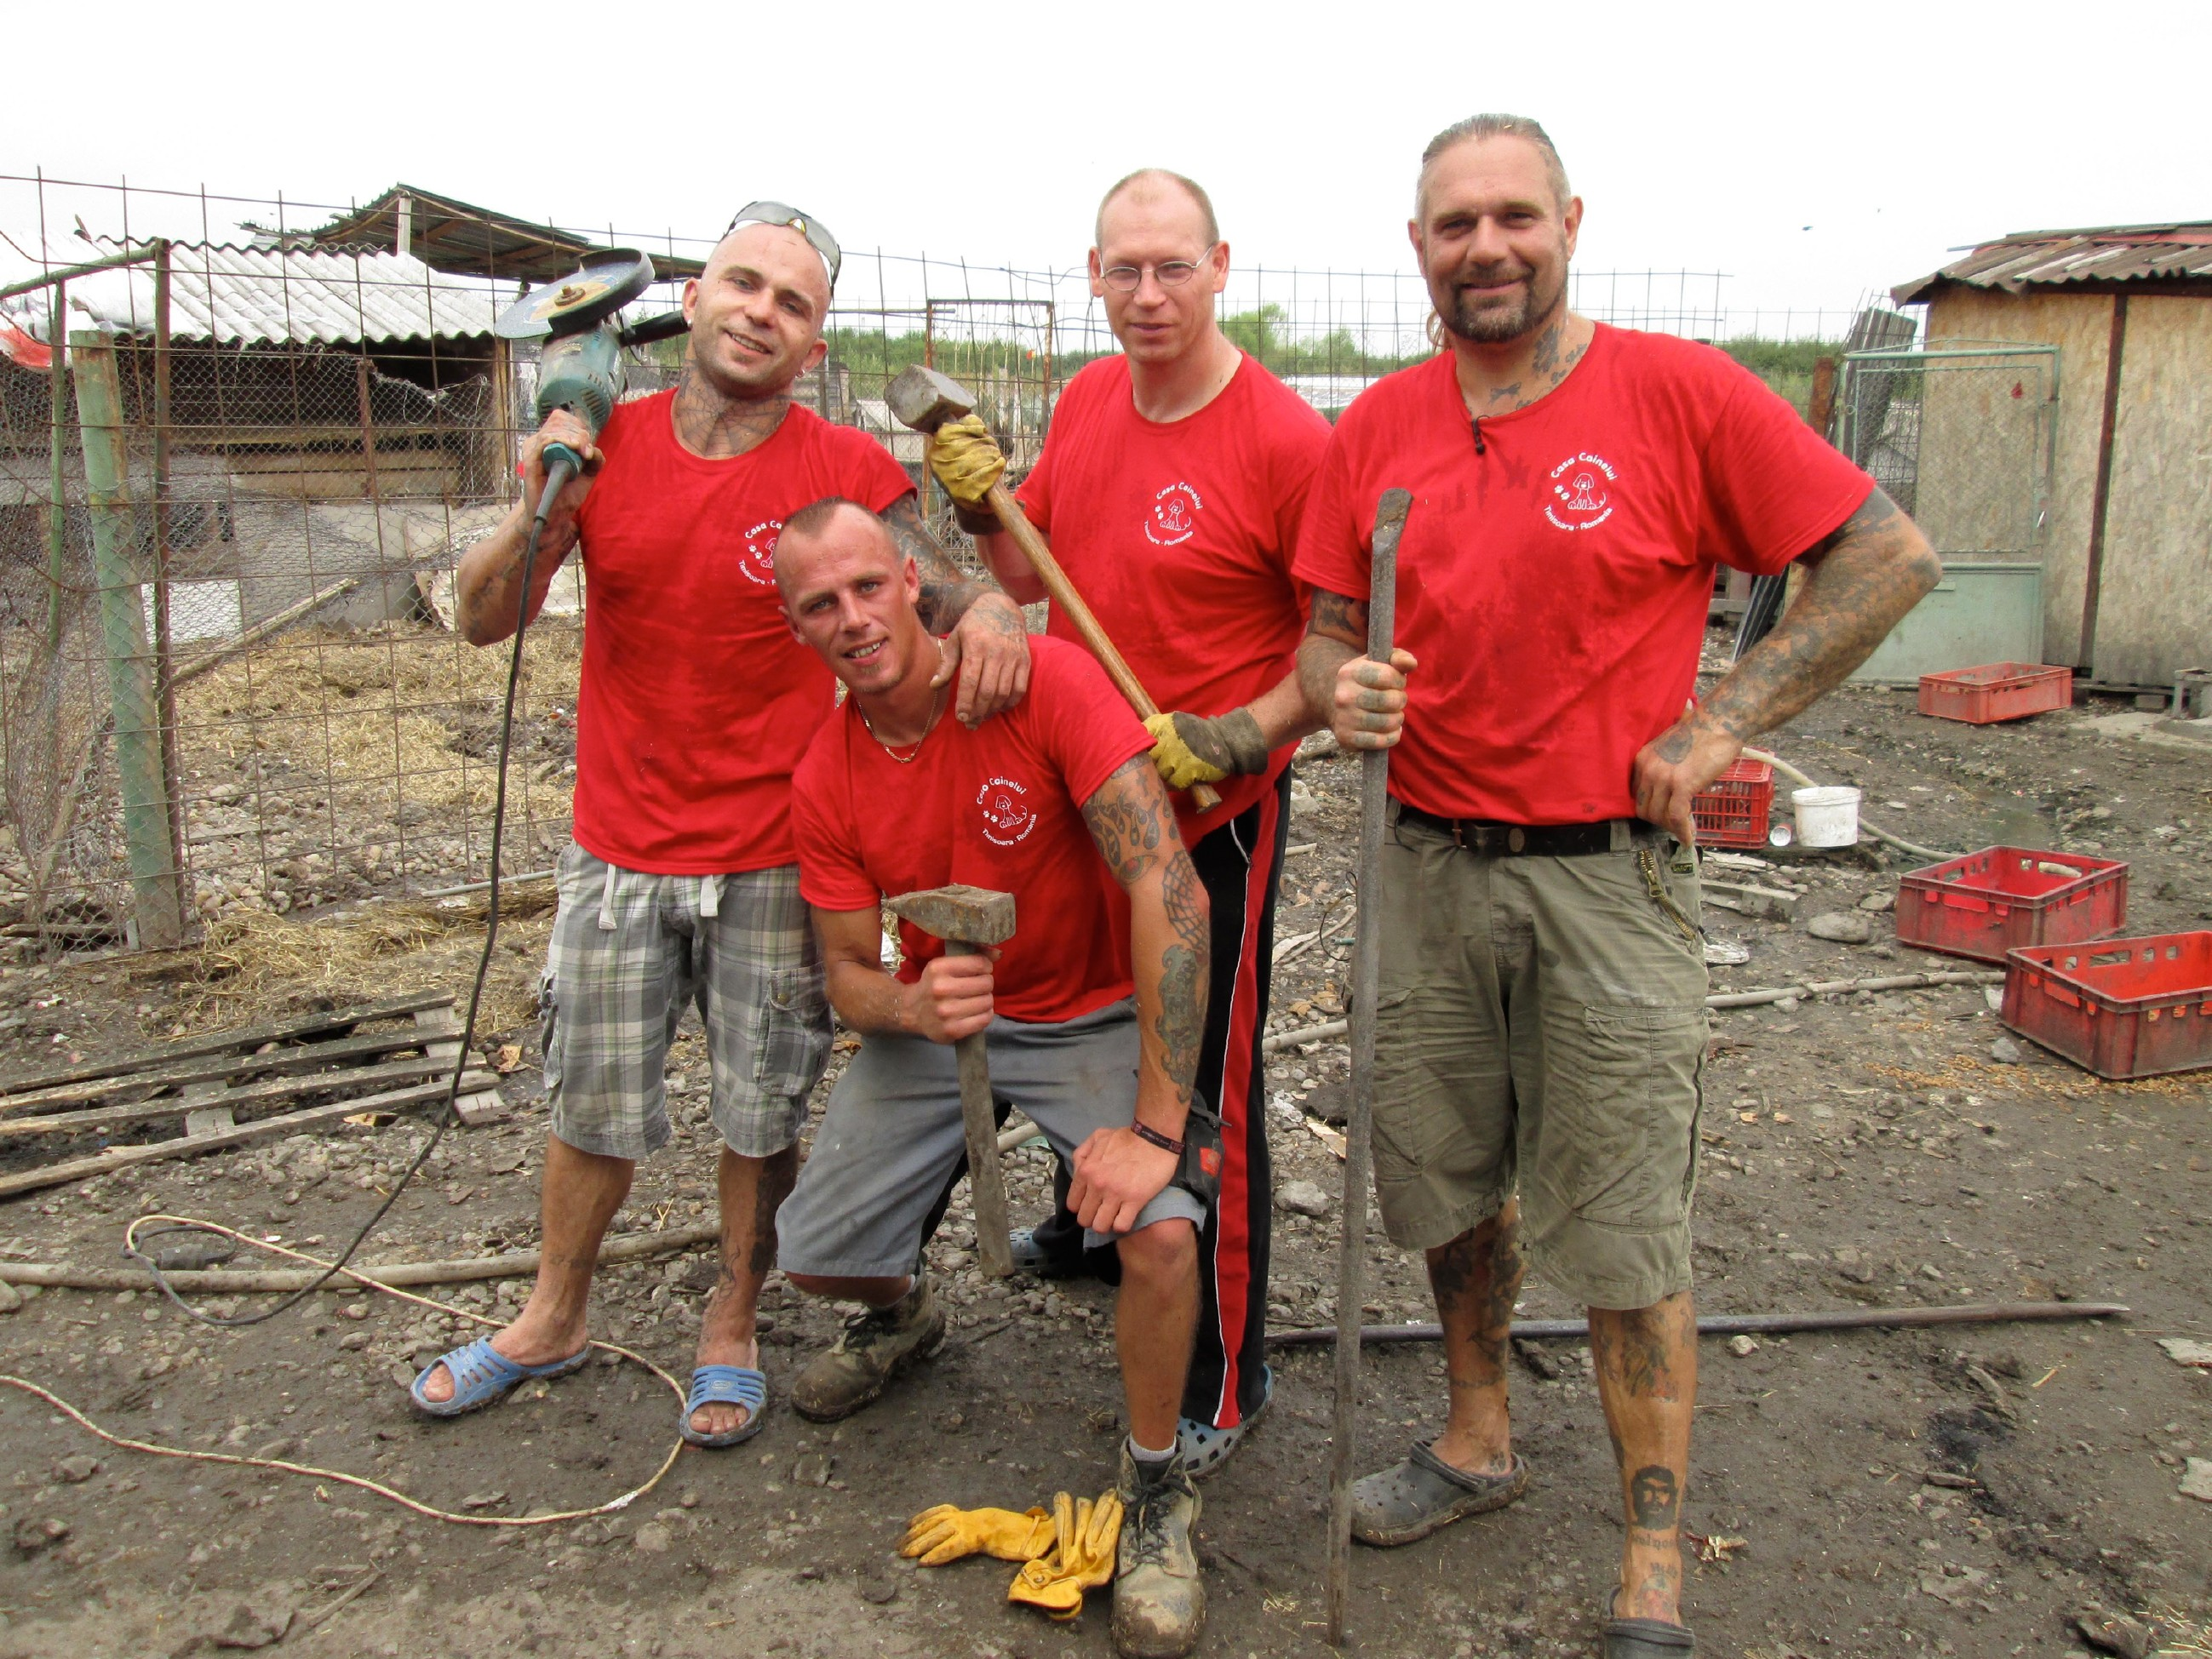 Harte Hunde - Ralf Seeger greift ein: Rumänien